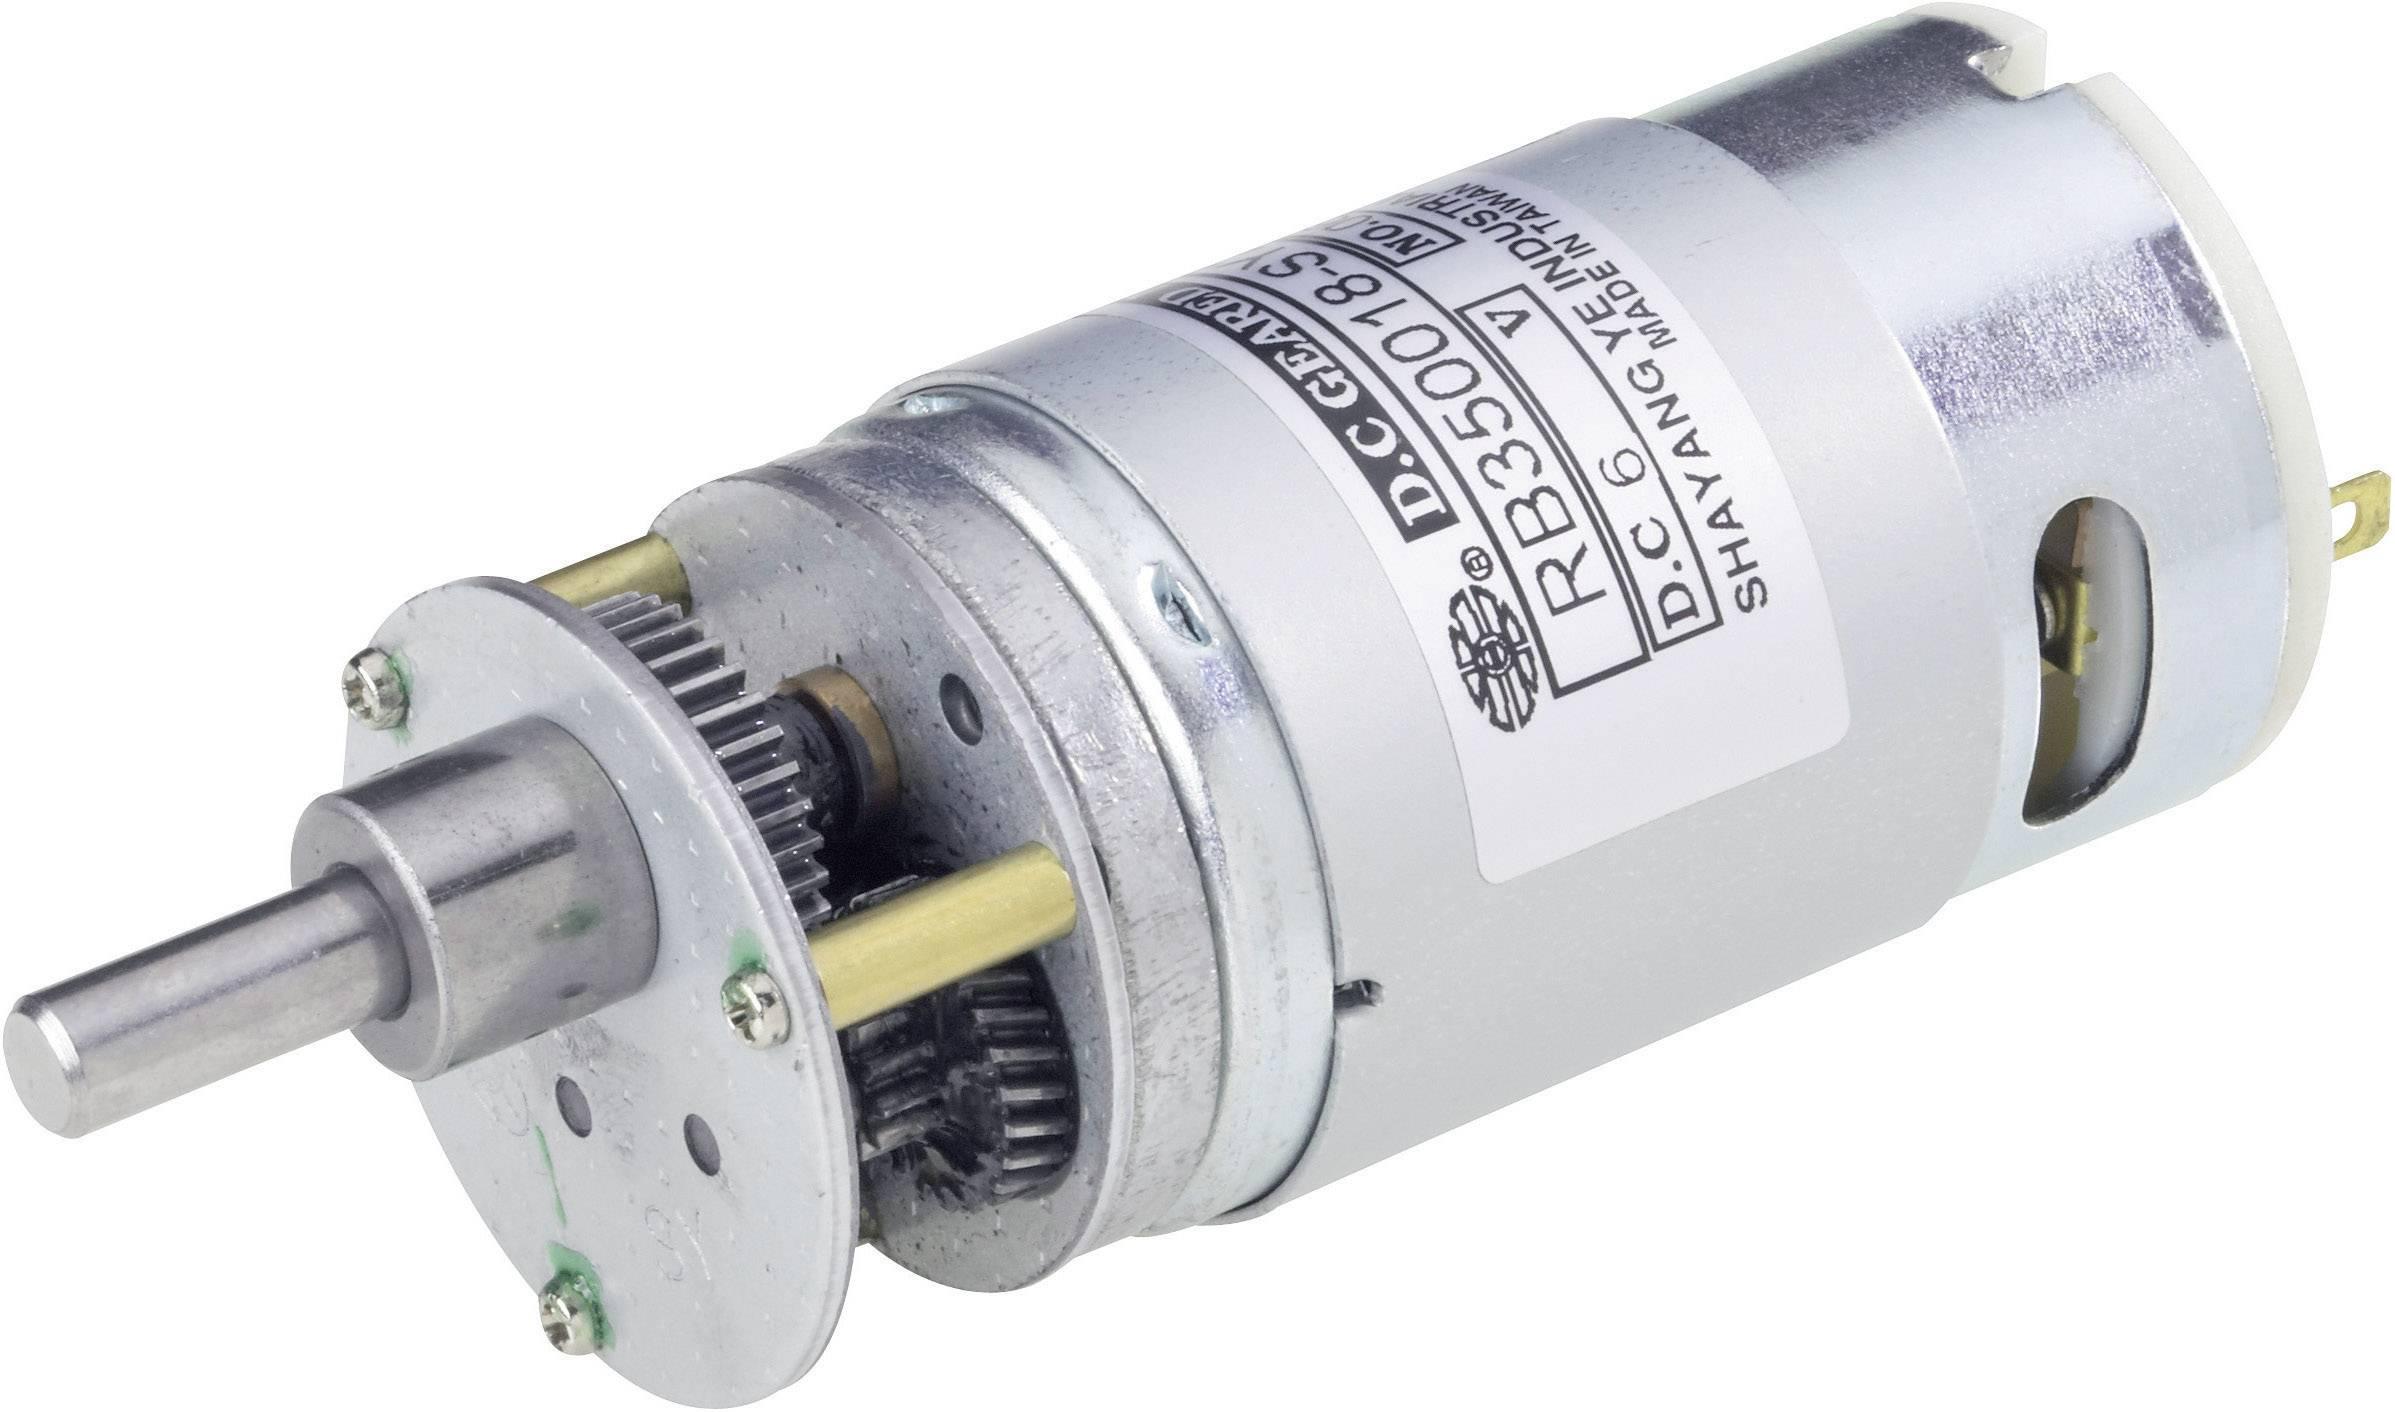 Vysoko výkonný motor Modelcraft RB350050-22723R, 12 V, 50:1